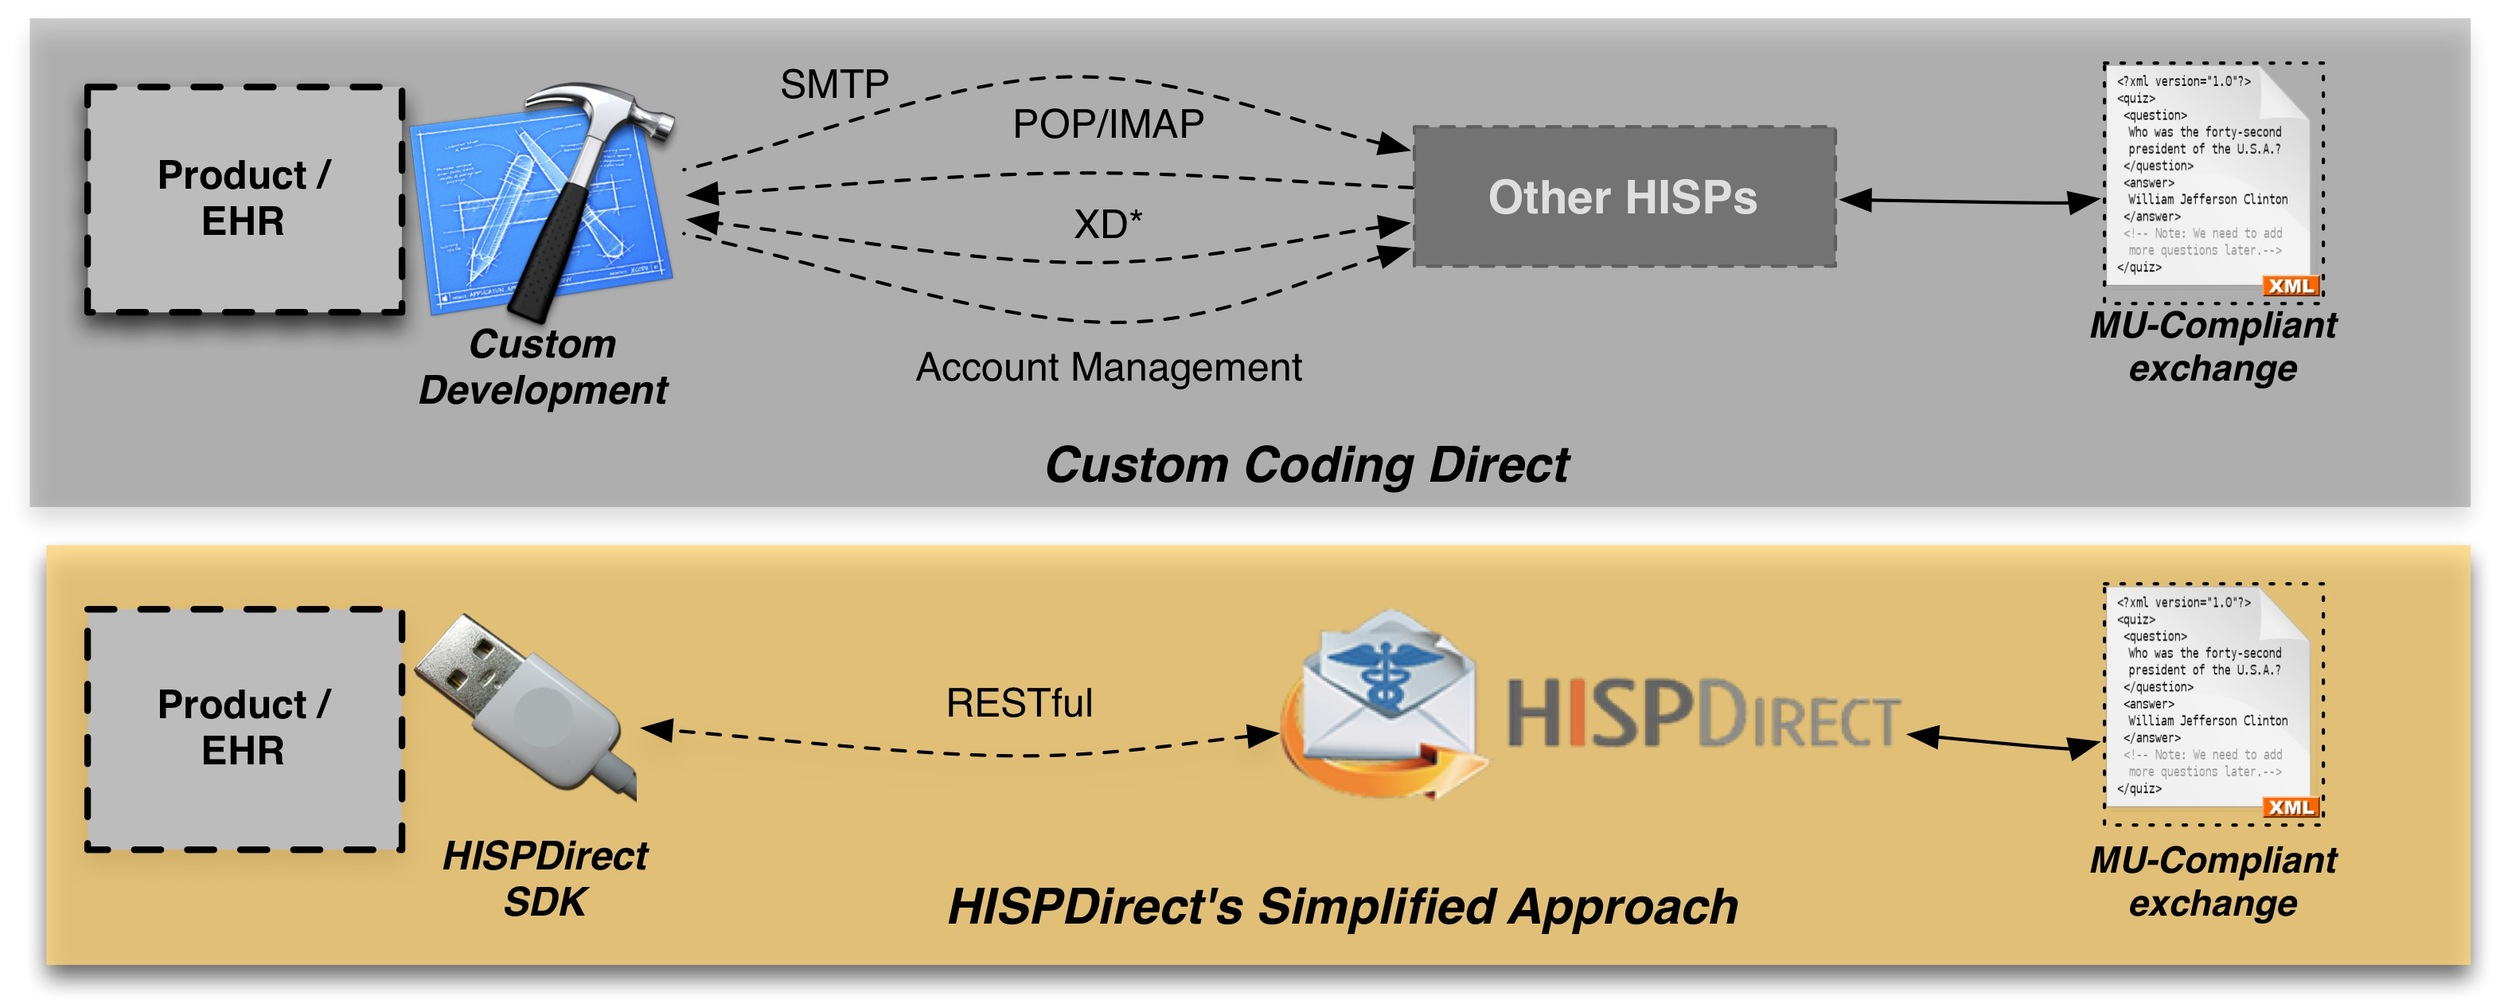 EHR Integration Overview - reduced.jpg